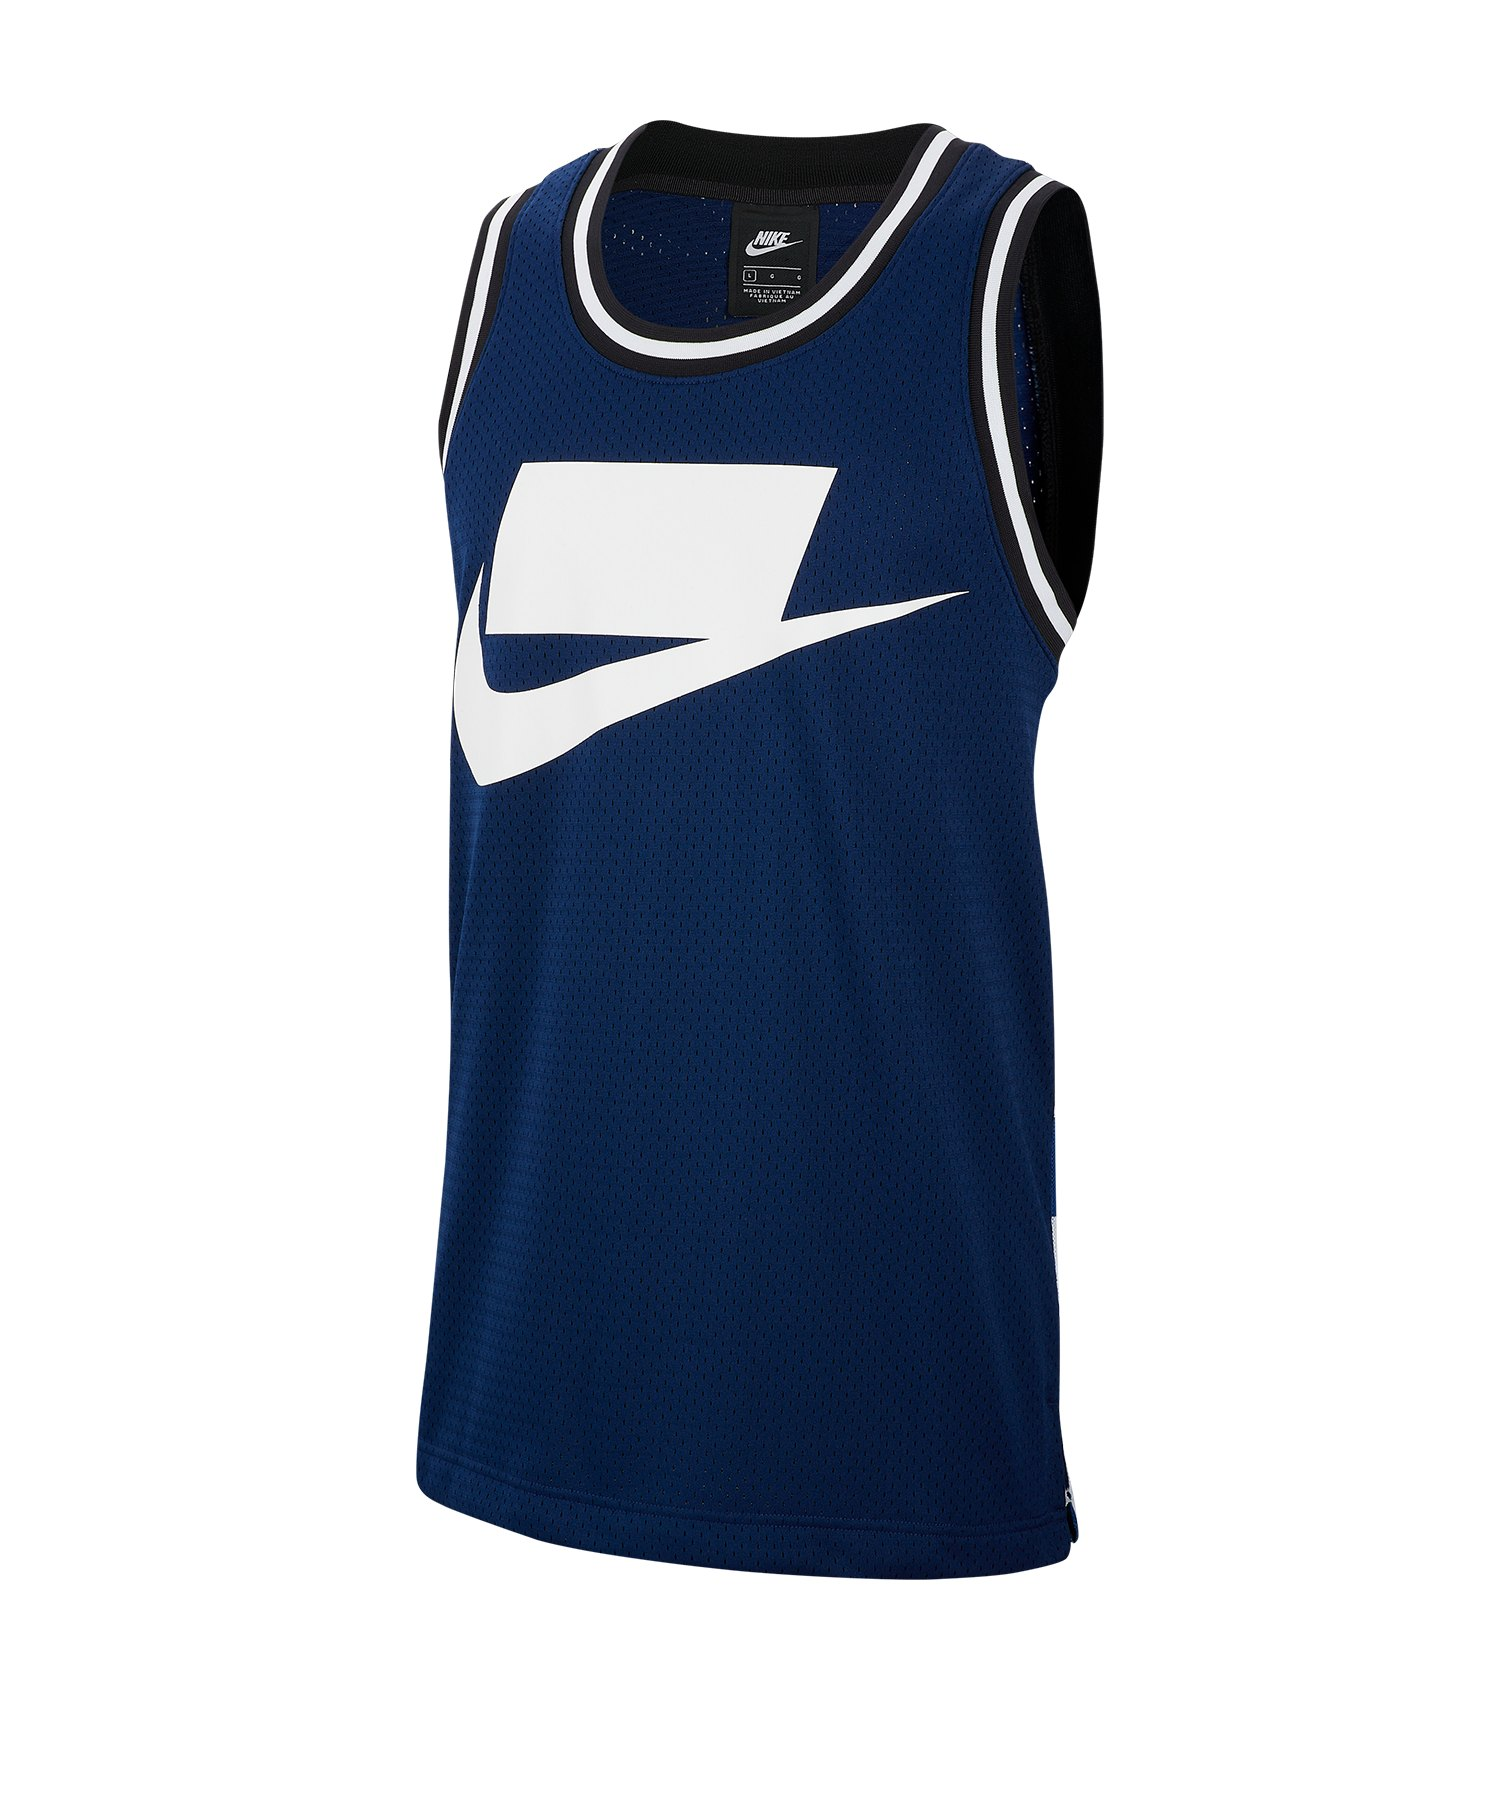 Nike Check AOP Tank Top Blau Weiss F492 - Blau